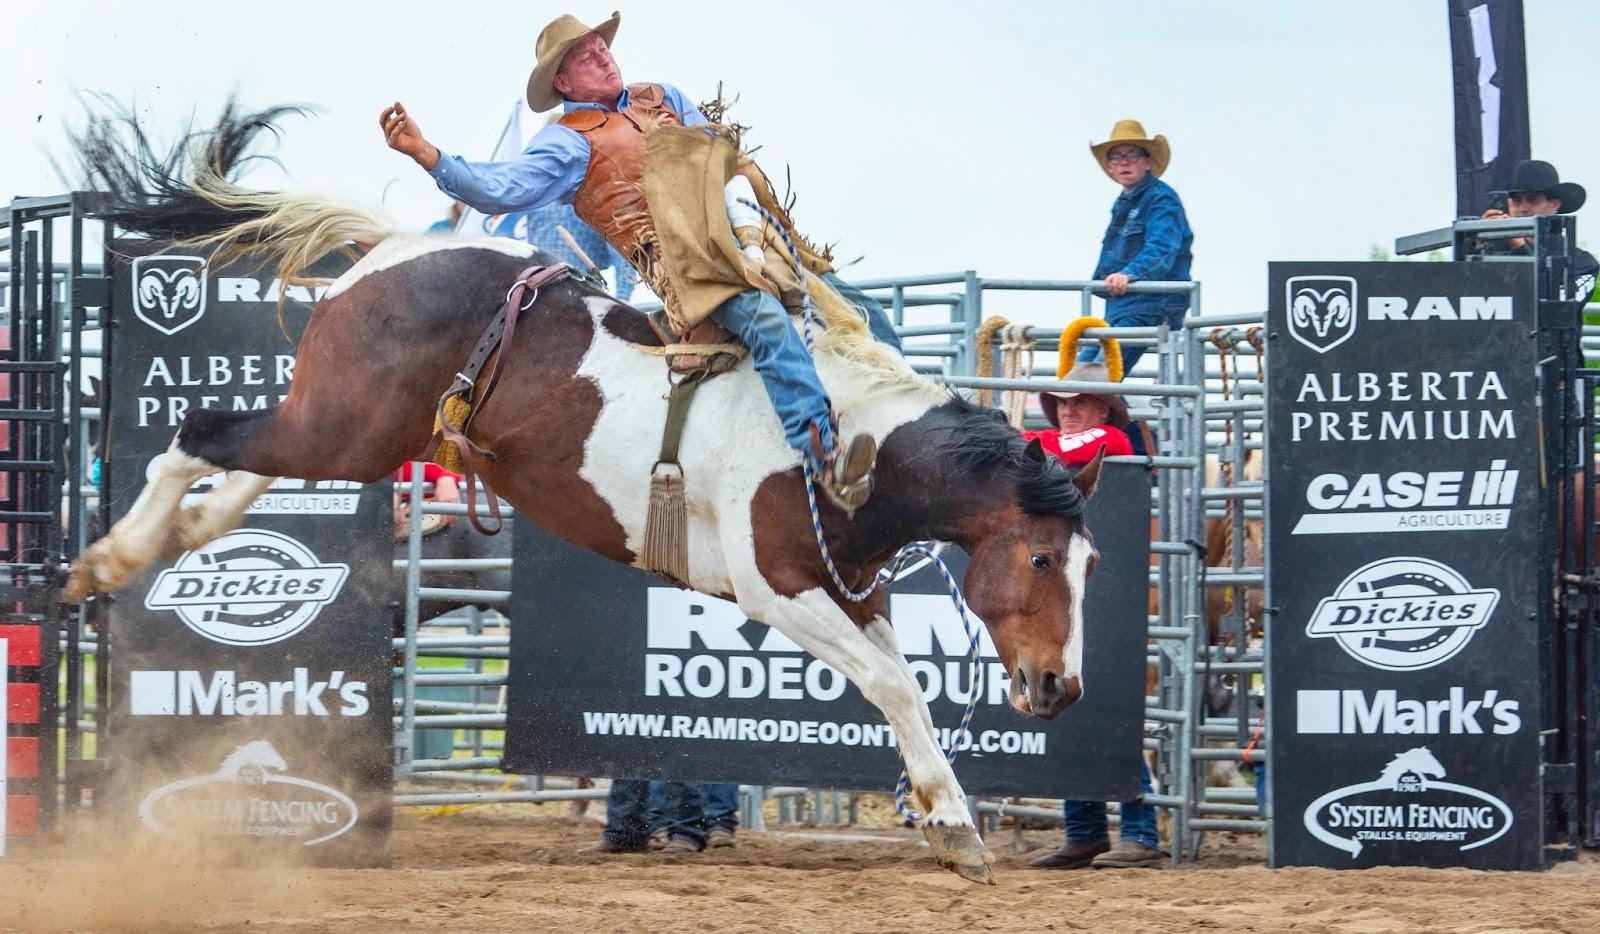 Schedule Burford Ram Rodeo